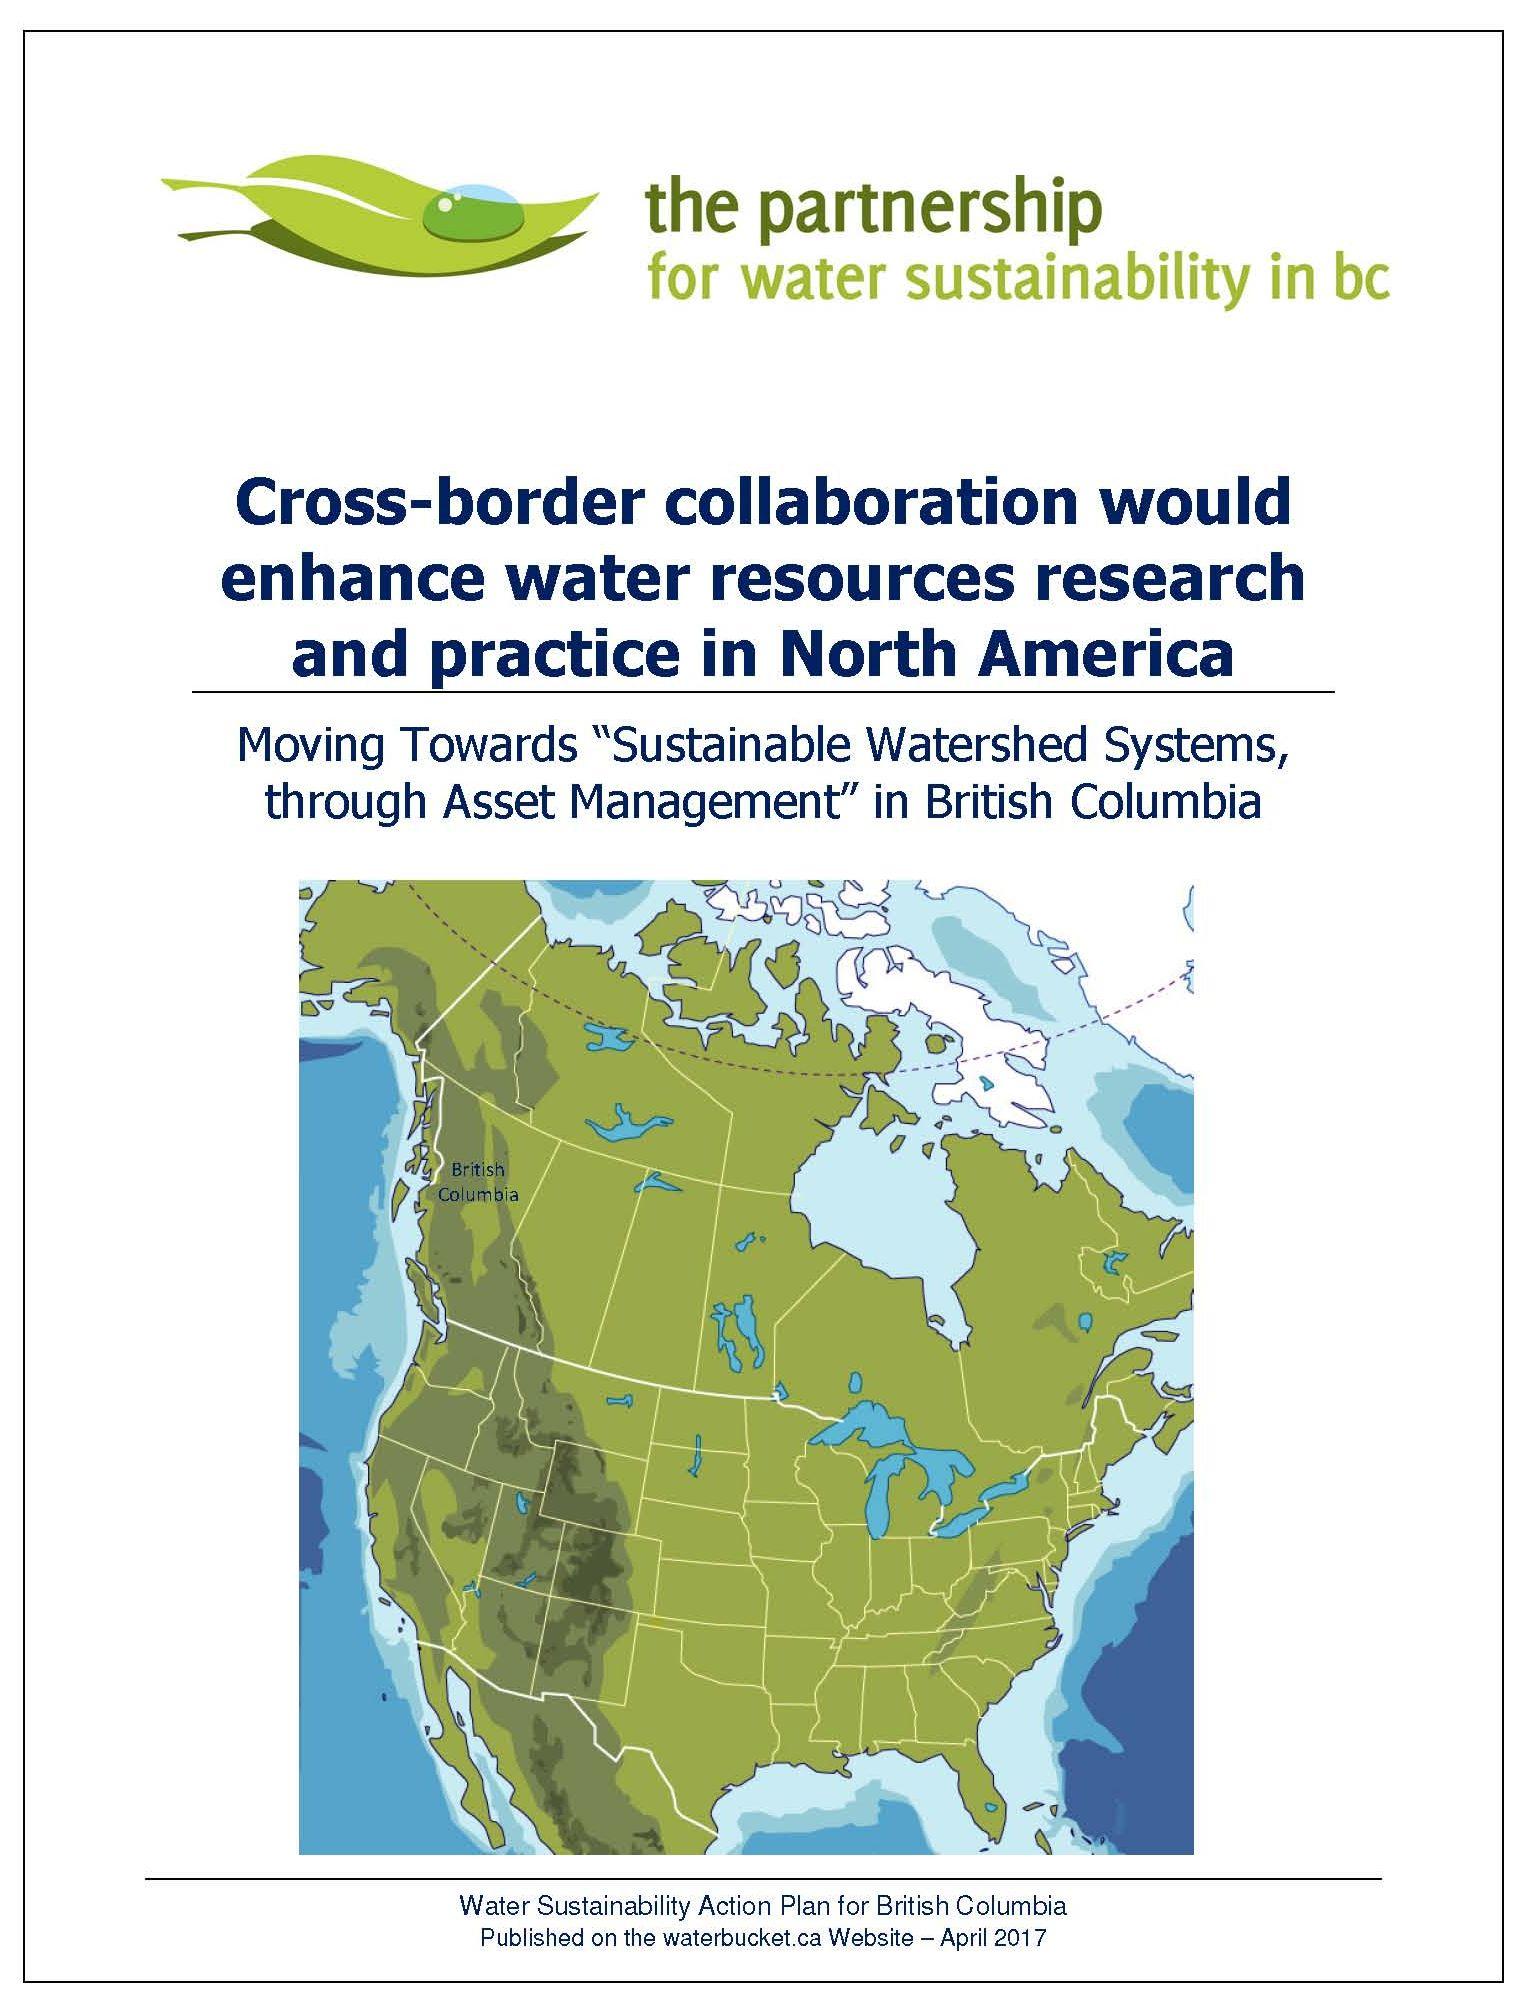 PWSBC_Collaboration-Enhances-Water-Resources-Practice_Apr2017_cover